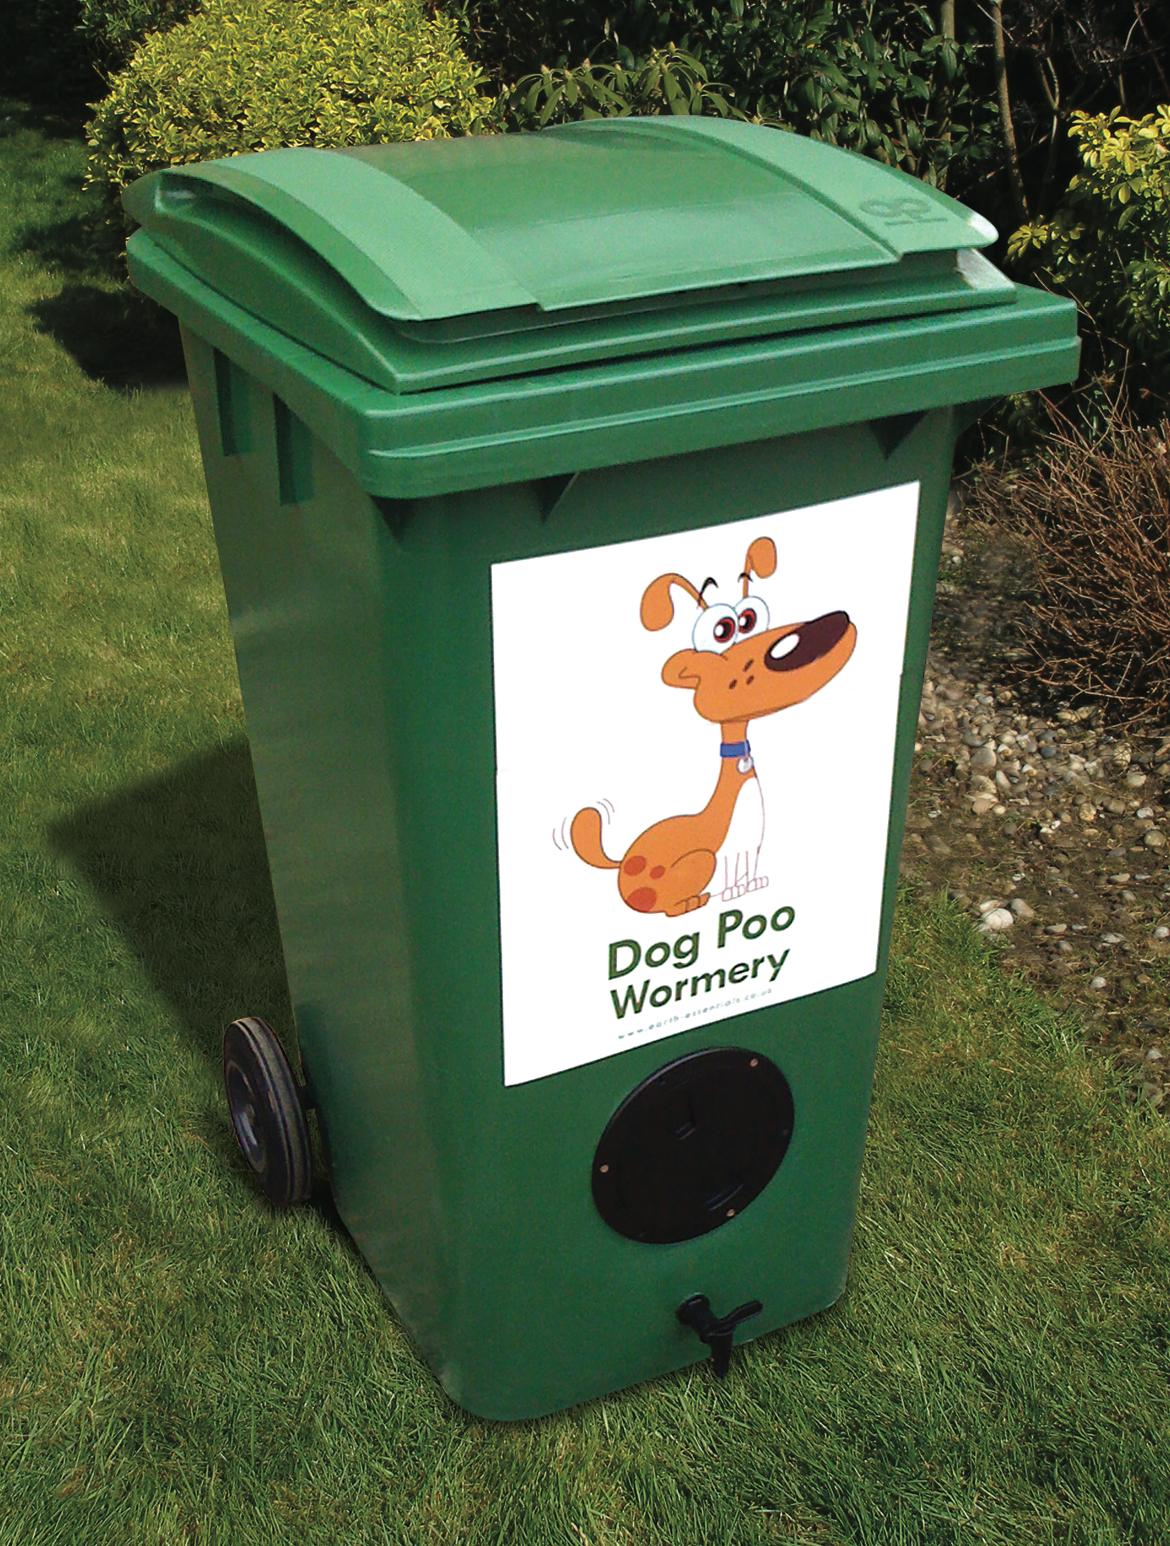 Worm dog poop composter